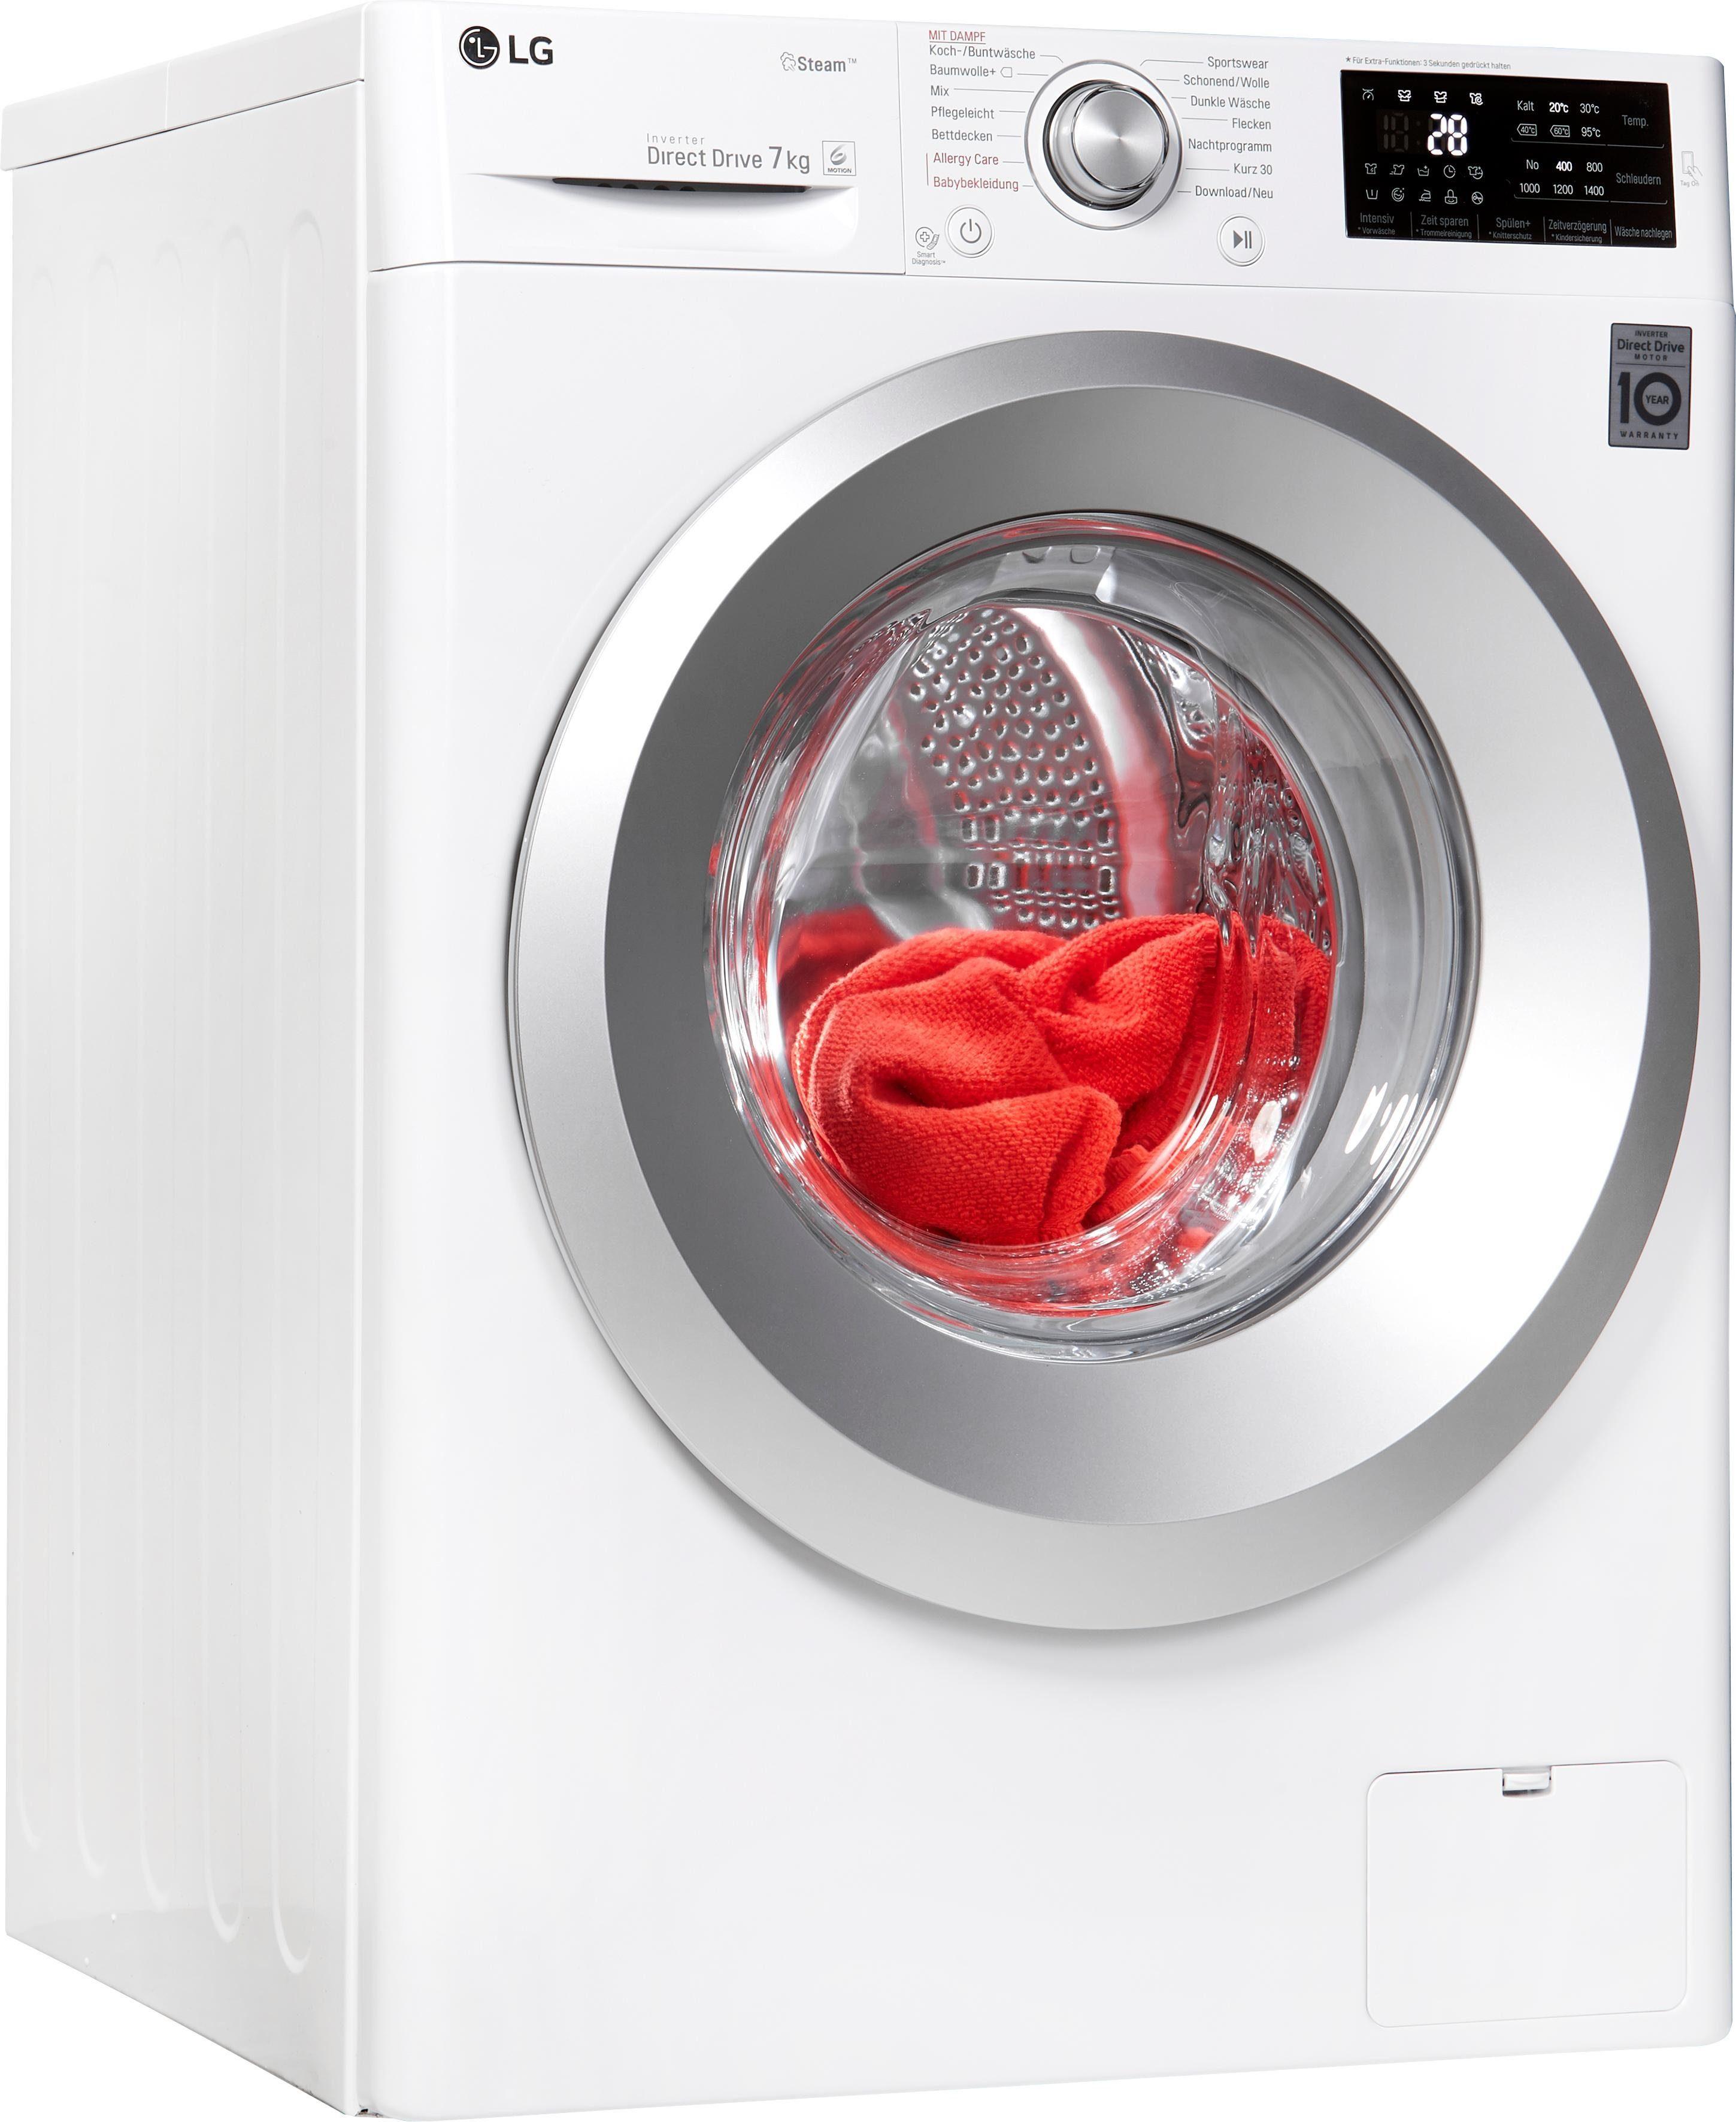 nike air max 90 mint in waschmaschine